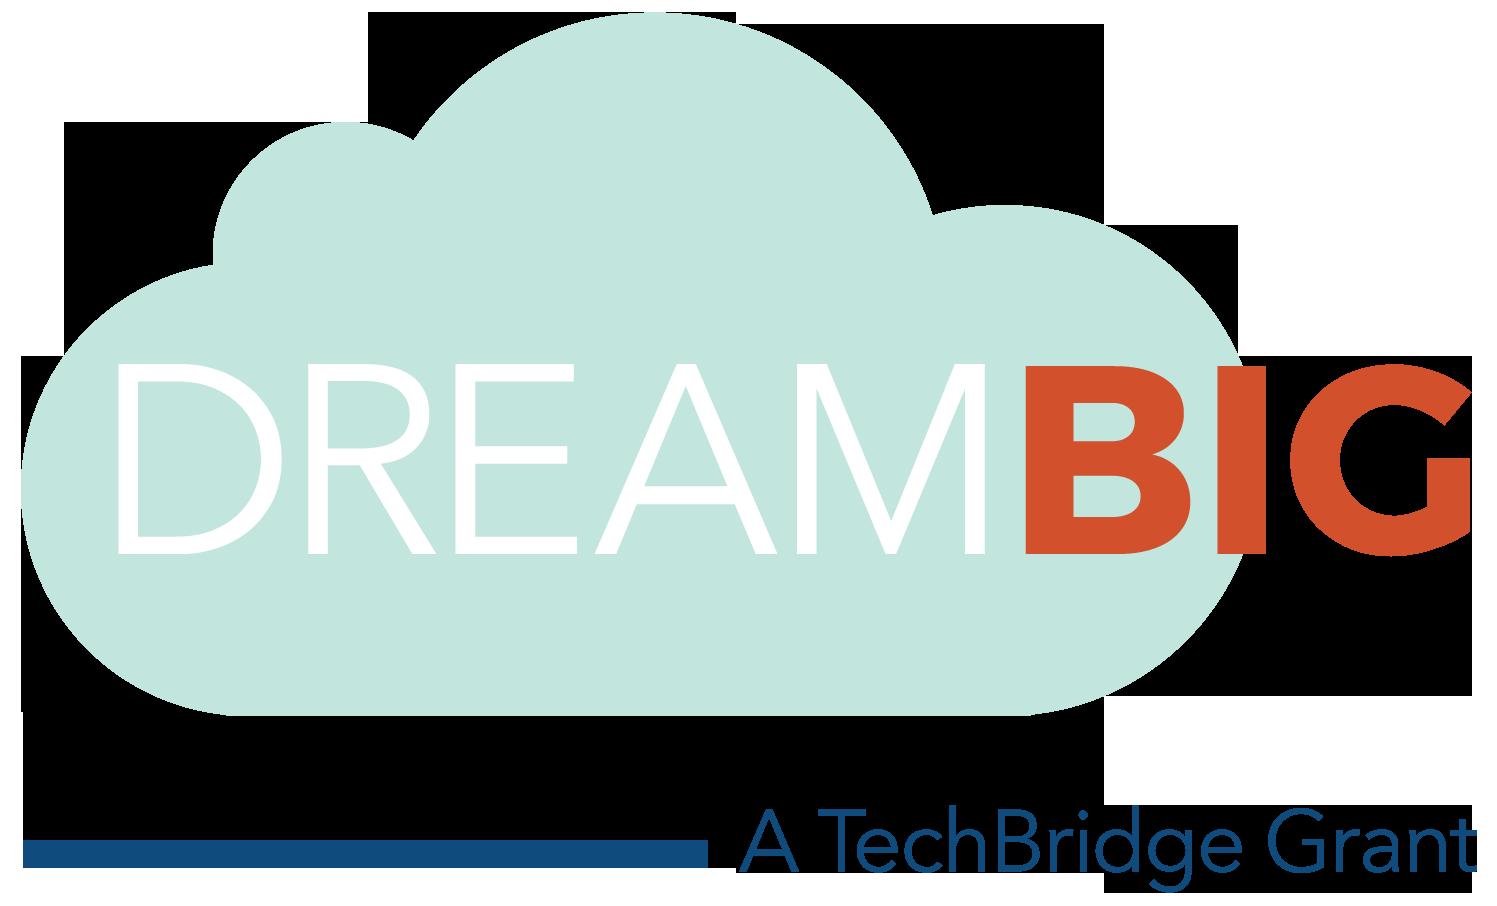 techbridge-dream-big-logo